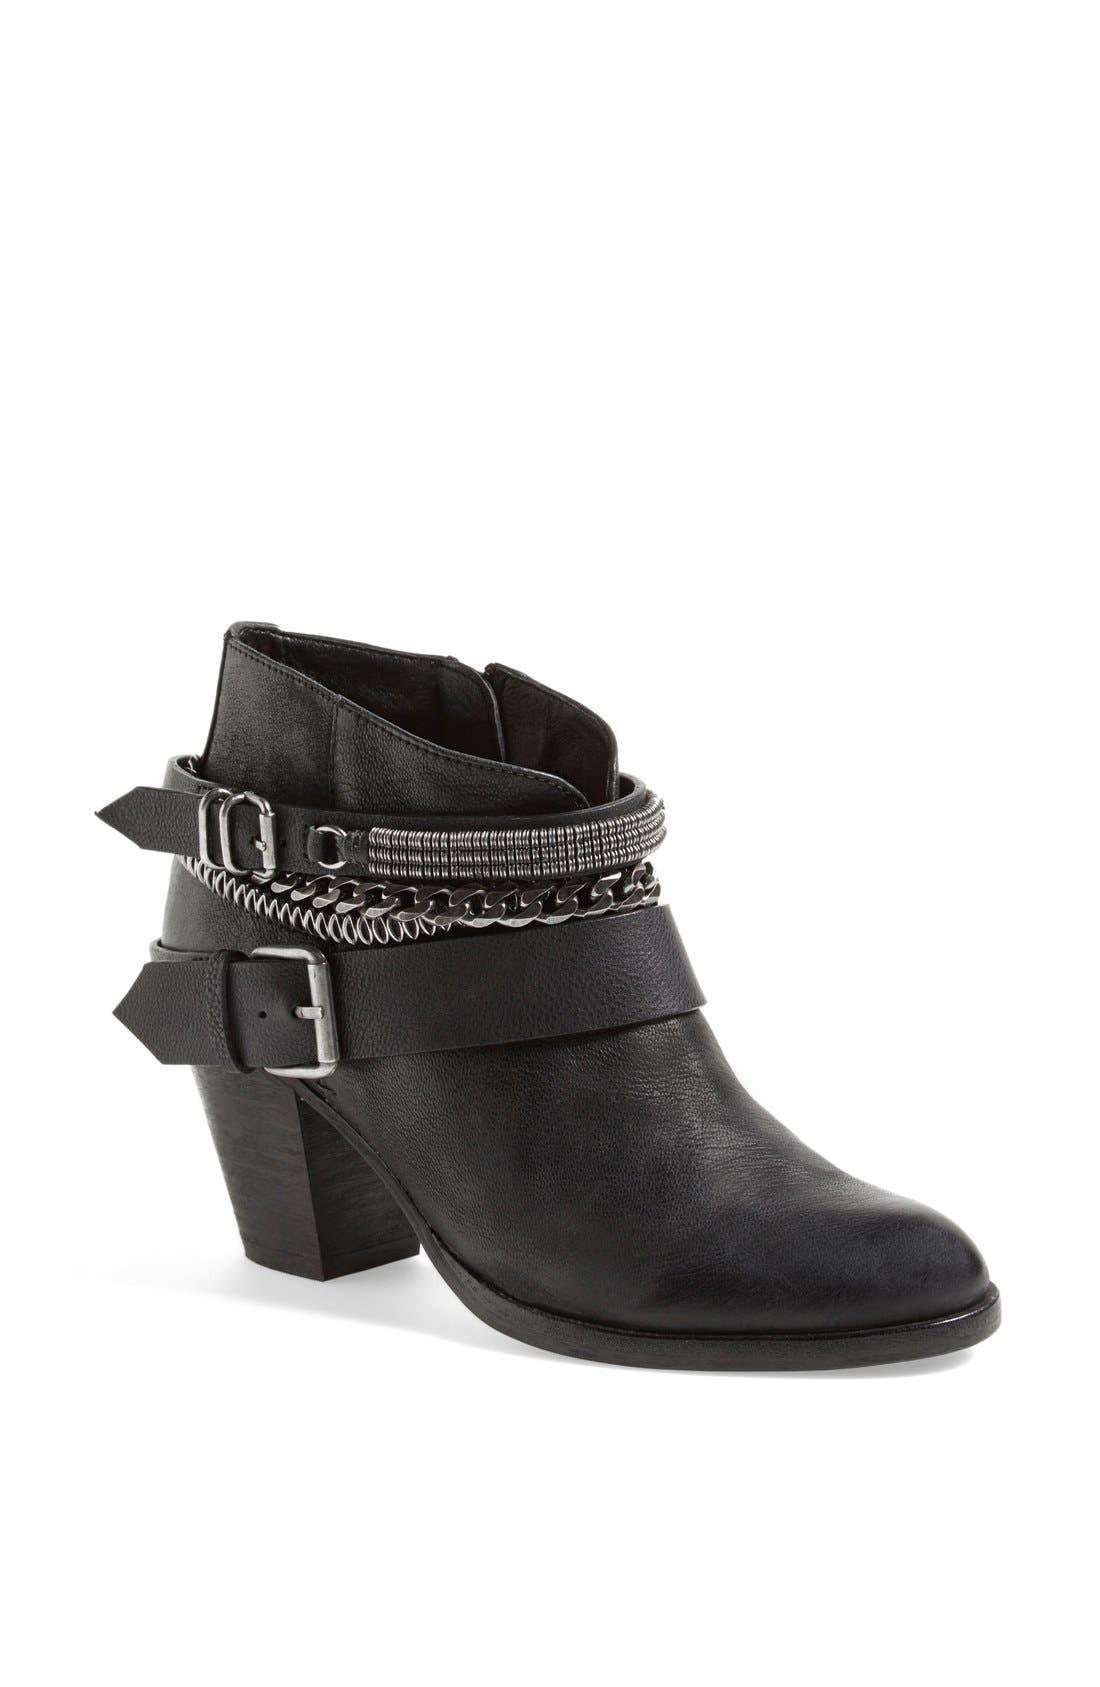 DOLCE VITA 'Yazmina' Leather Bootie, Main, color, 019